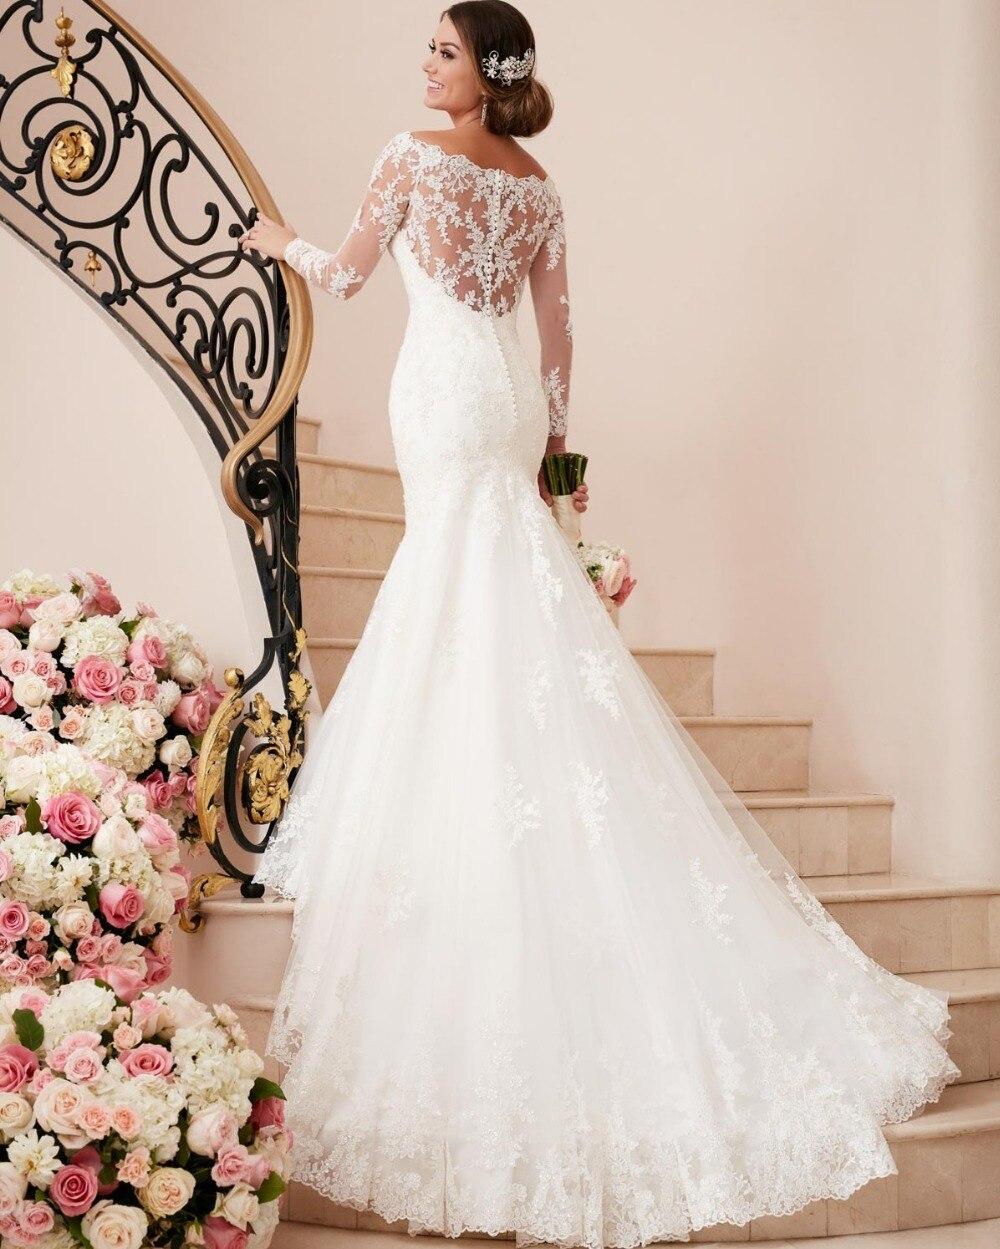 Wedding Long Sleeve Mermaid Wedding Dresses popular long sleeve mermaid wedding dress buy cheap dress